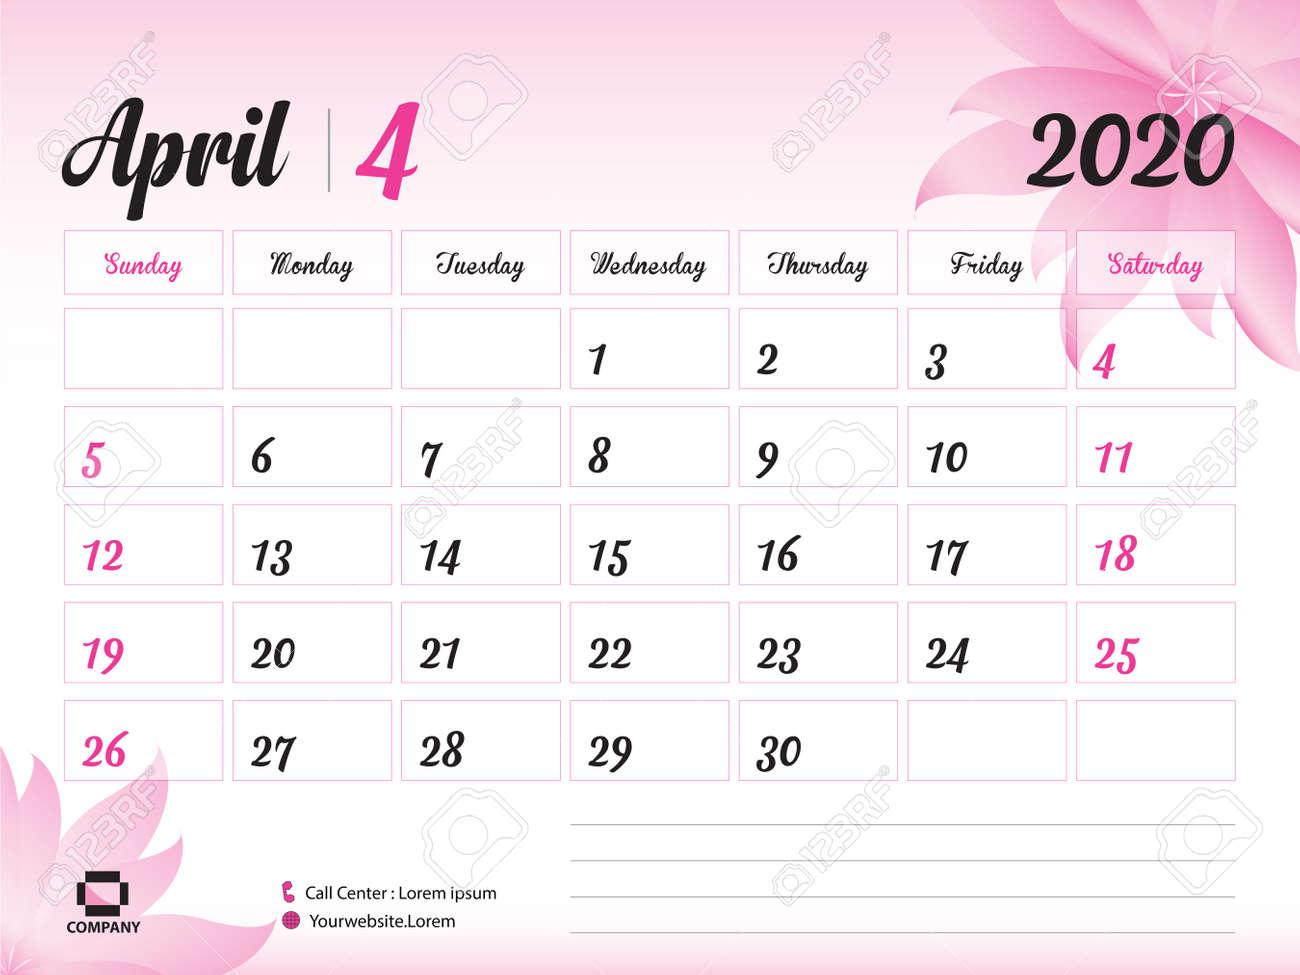 April Printable Calendar 2020.April 2020 Year Template Calendar 2020 Desk Calendar Design